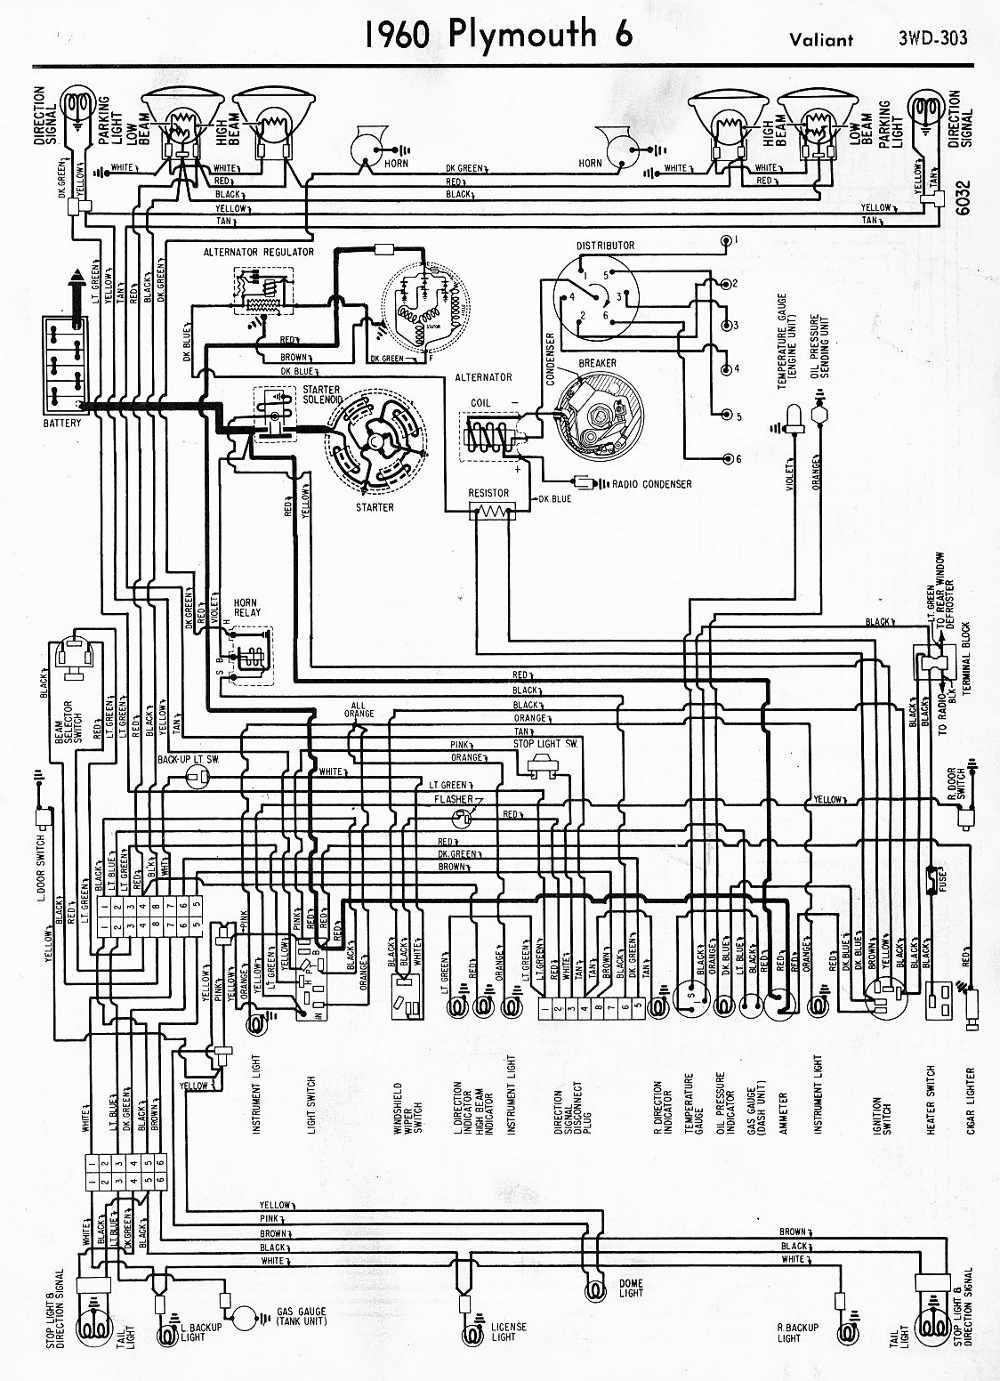 small resolution of chrysler valiant wiring diagram simple wiring diagram dodge dakota wiring diagrams 1966 plymouth valiant wiring diagram